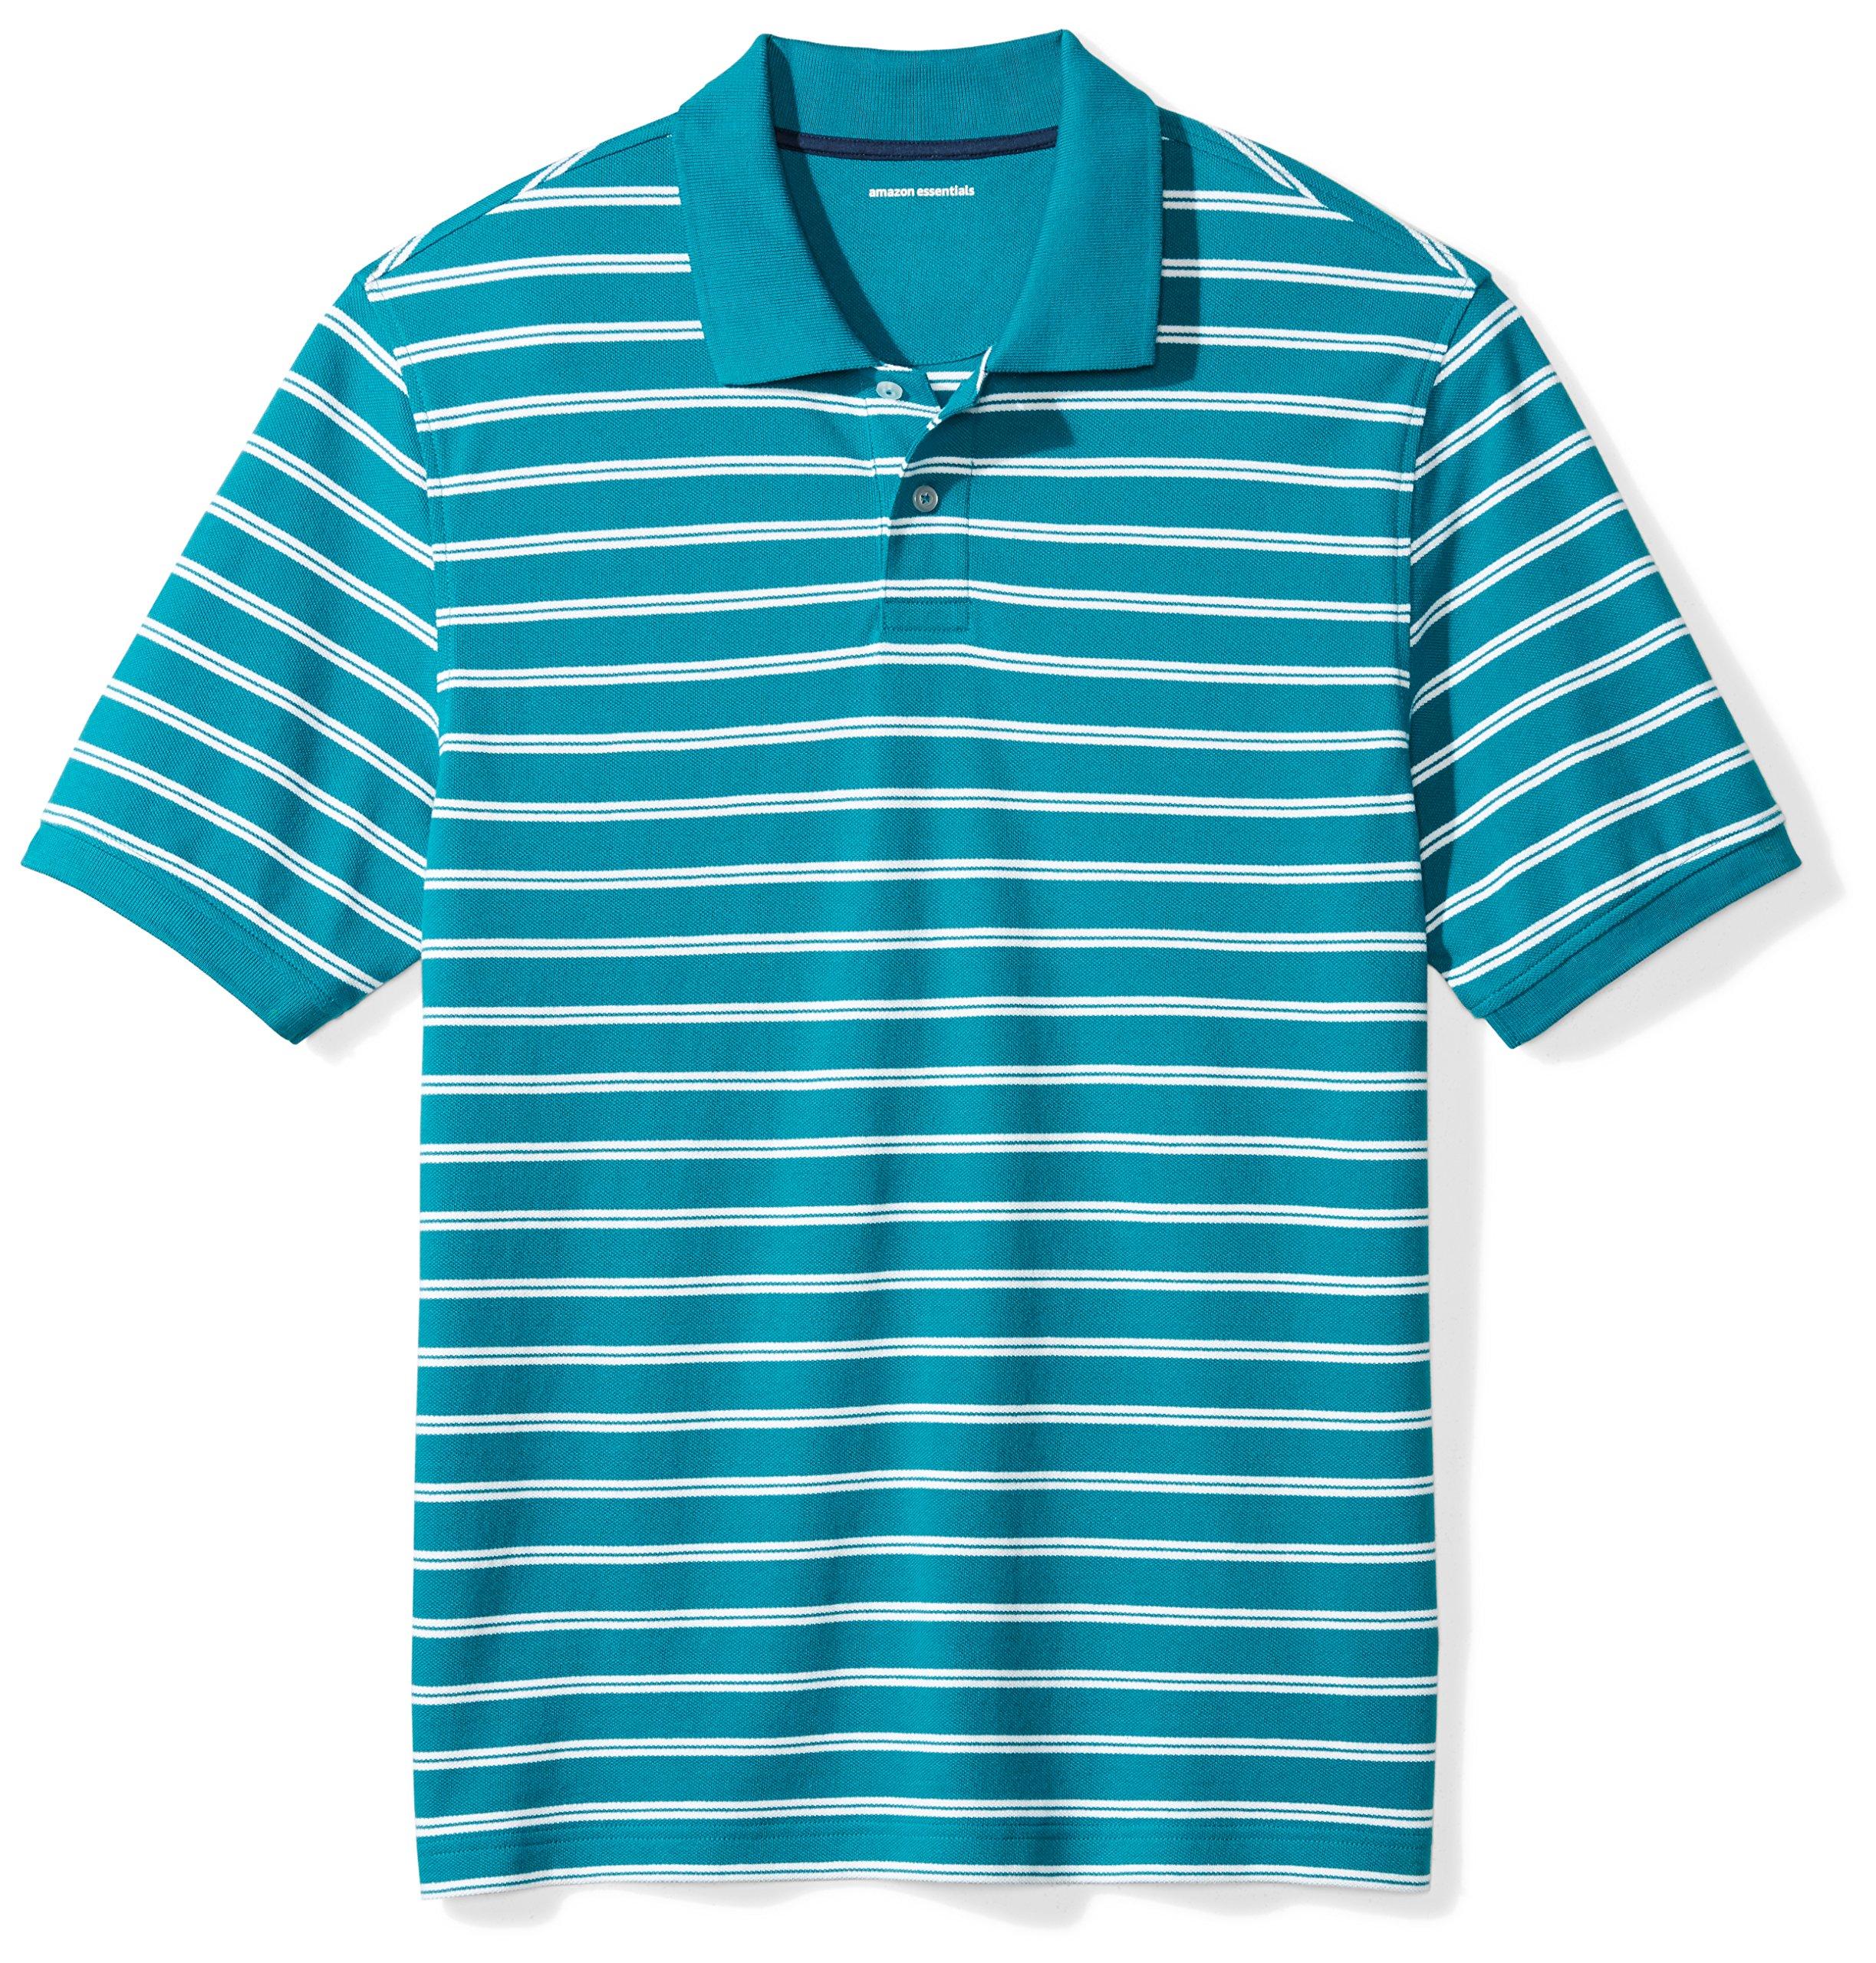 Amazon Essentials Men's Regular-Fit Striped Cotton Pique Polo Shirt, Teal Stripe, X-Large